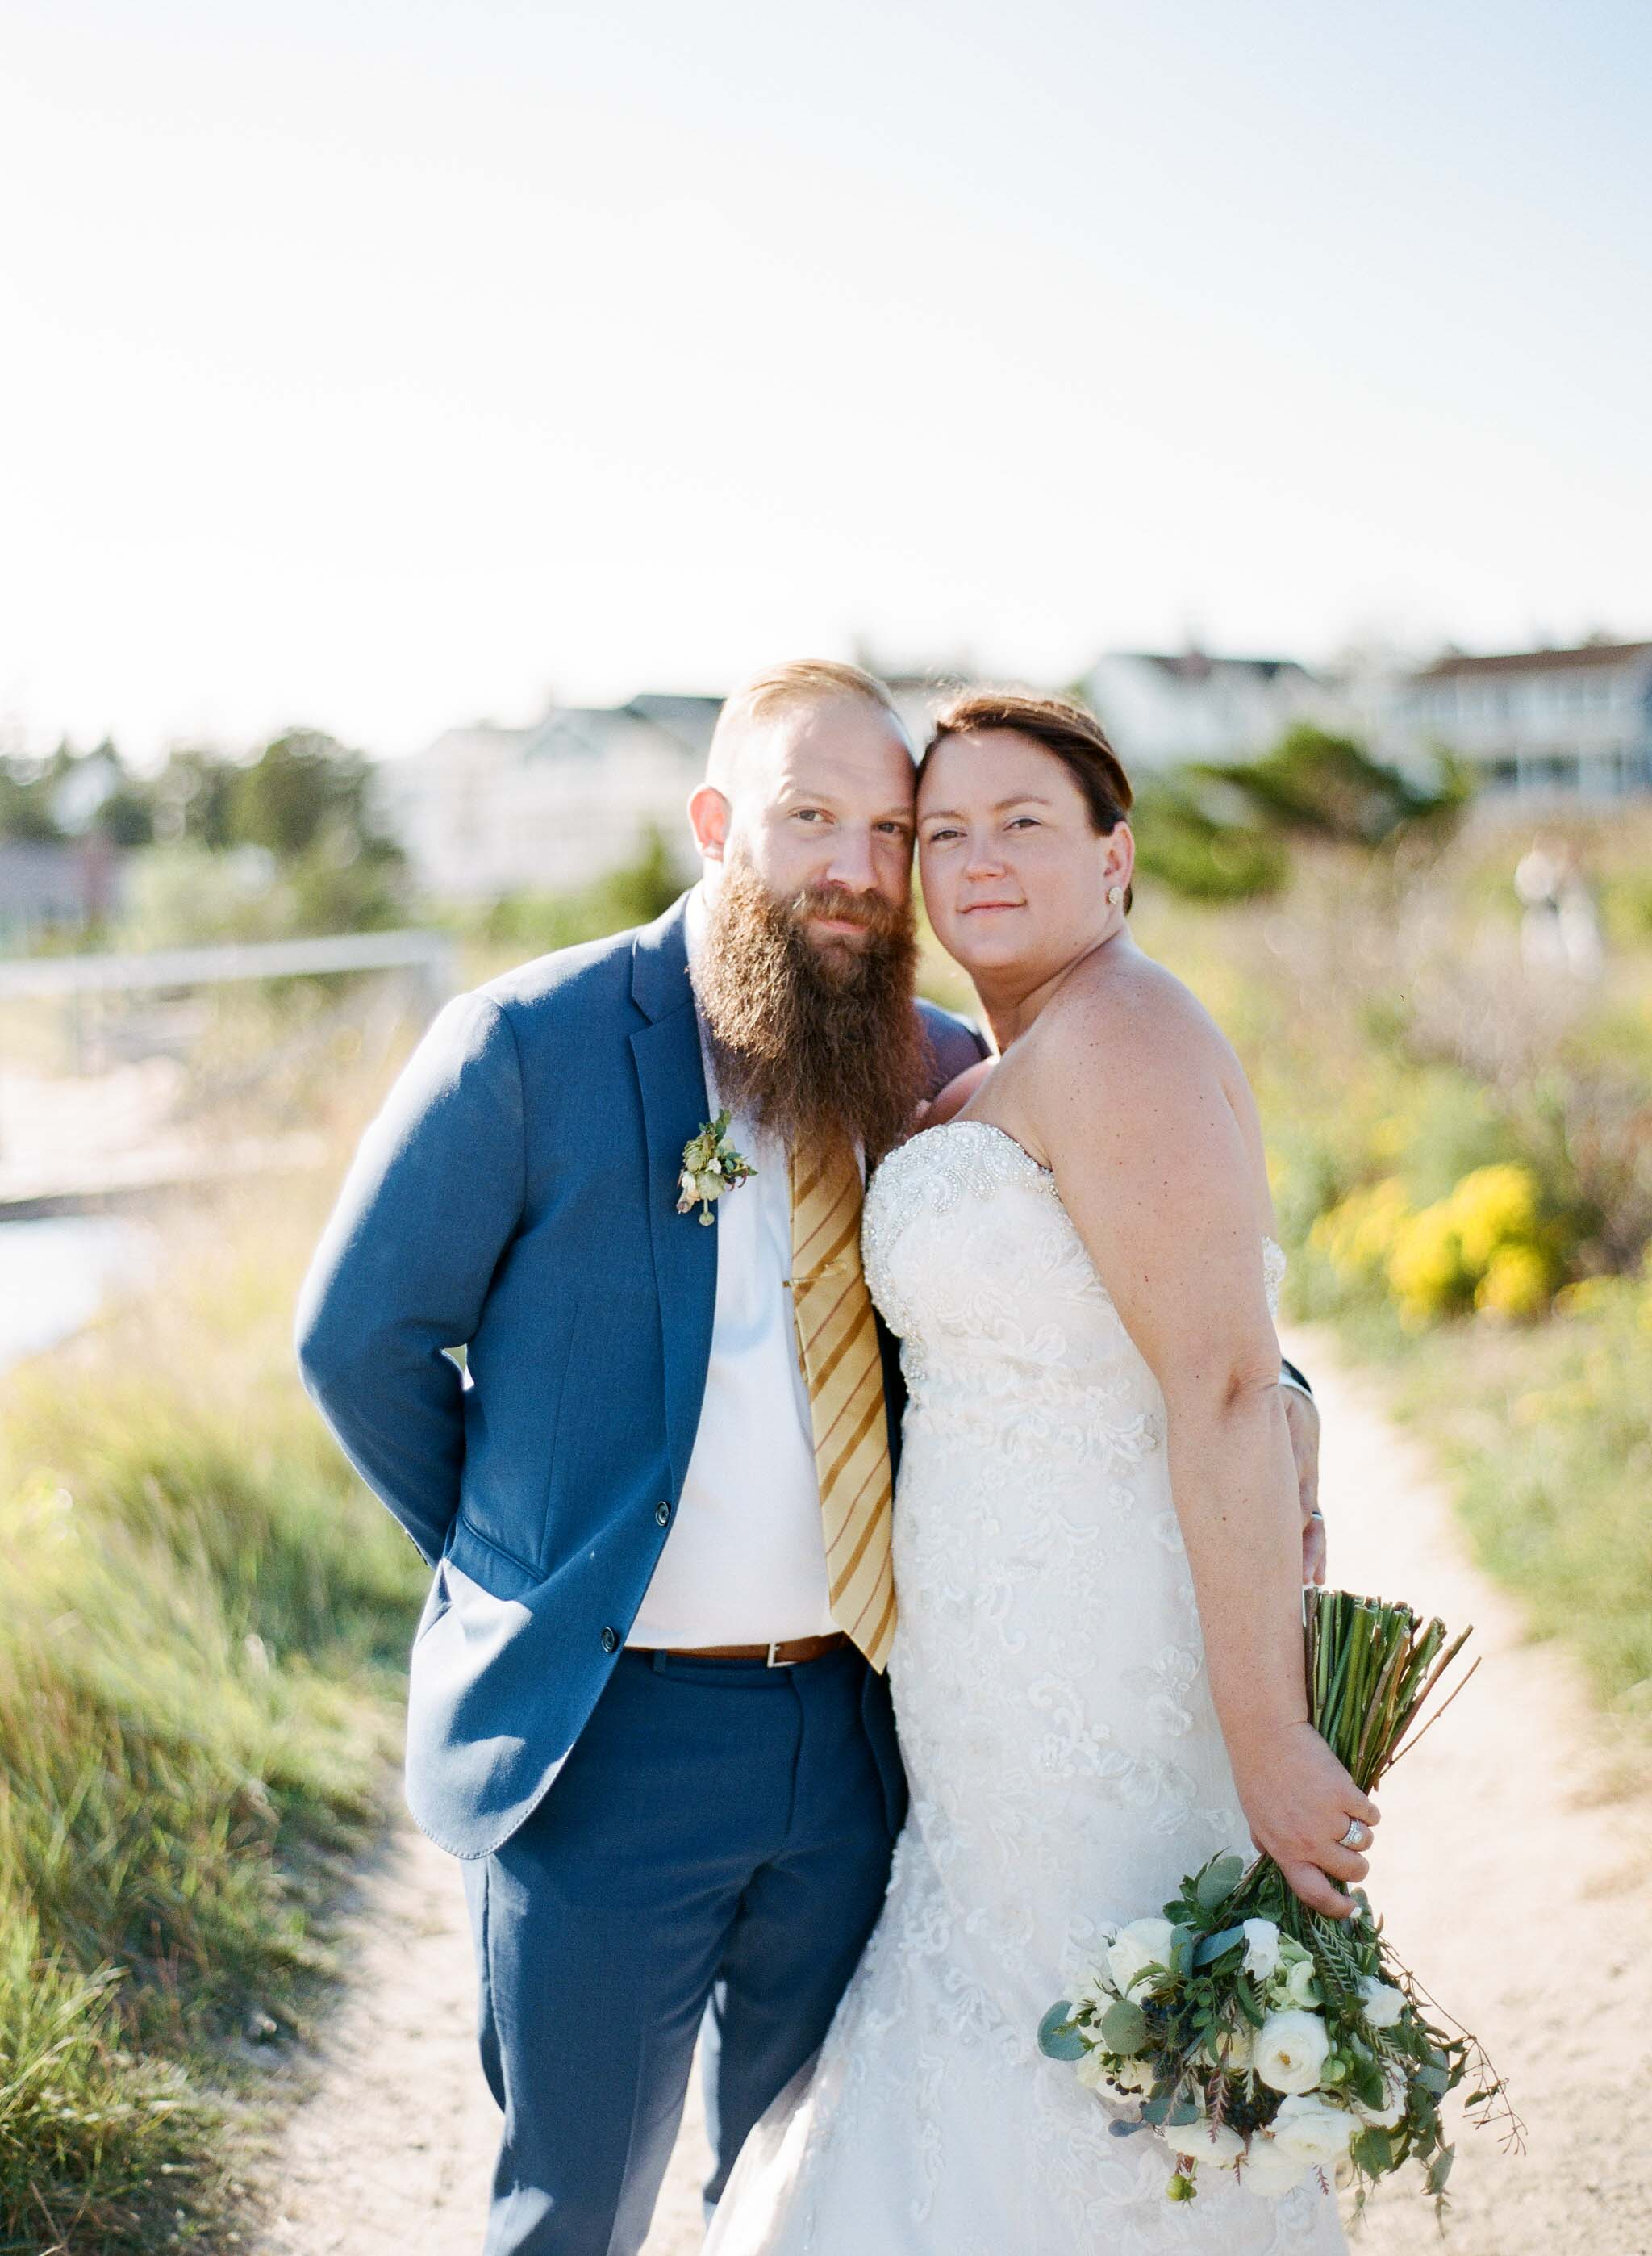 Marthas-vineyard-wedding-38.jpg